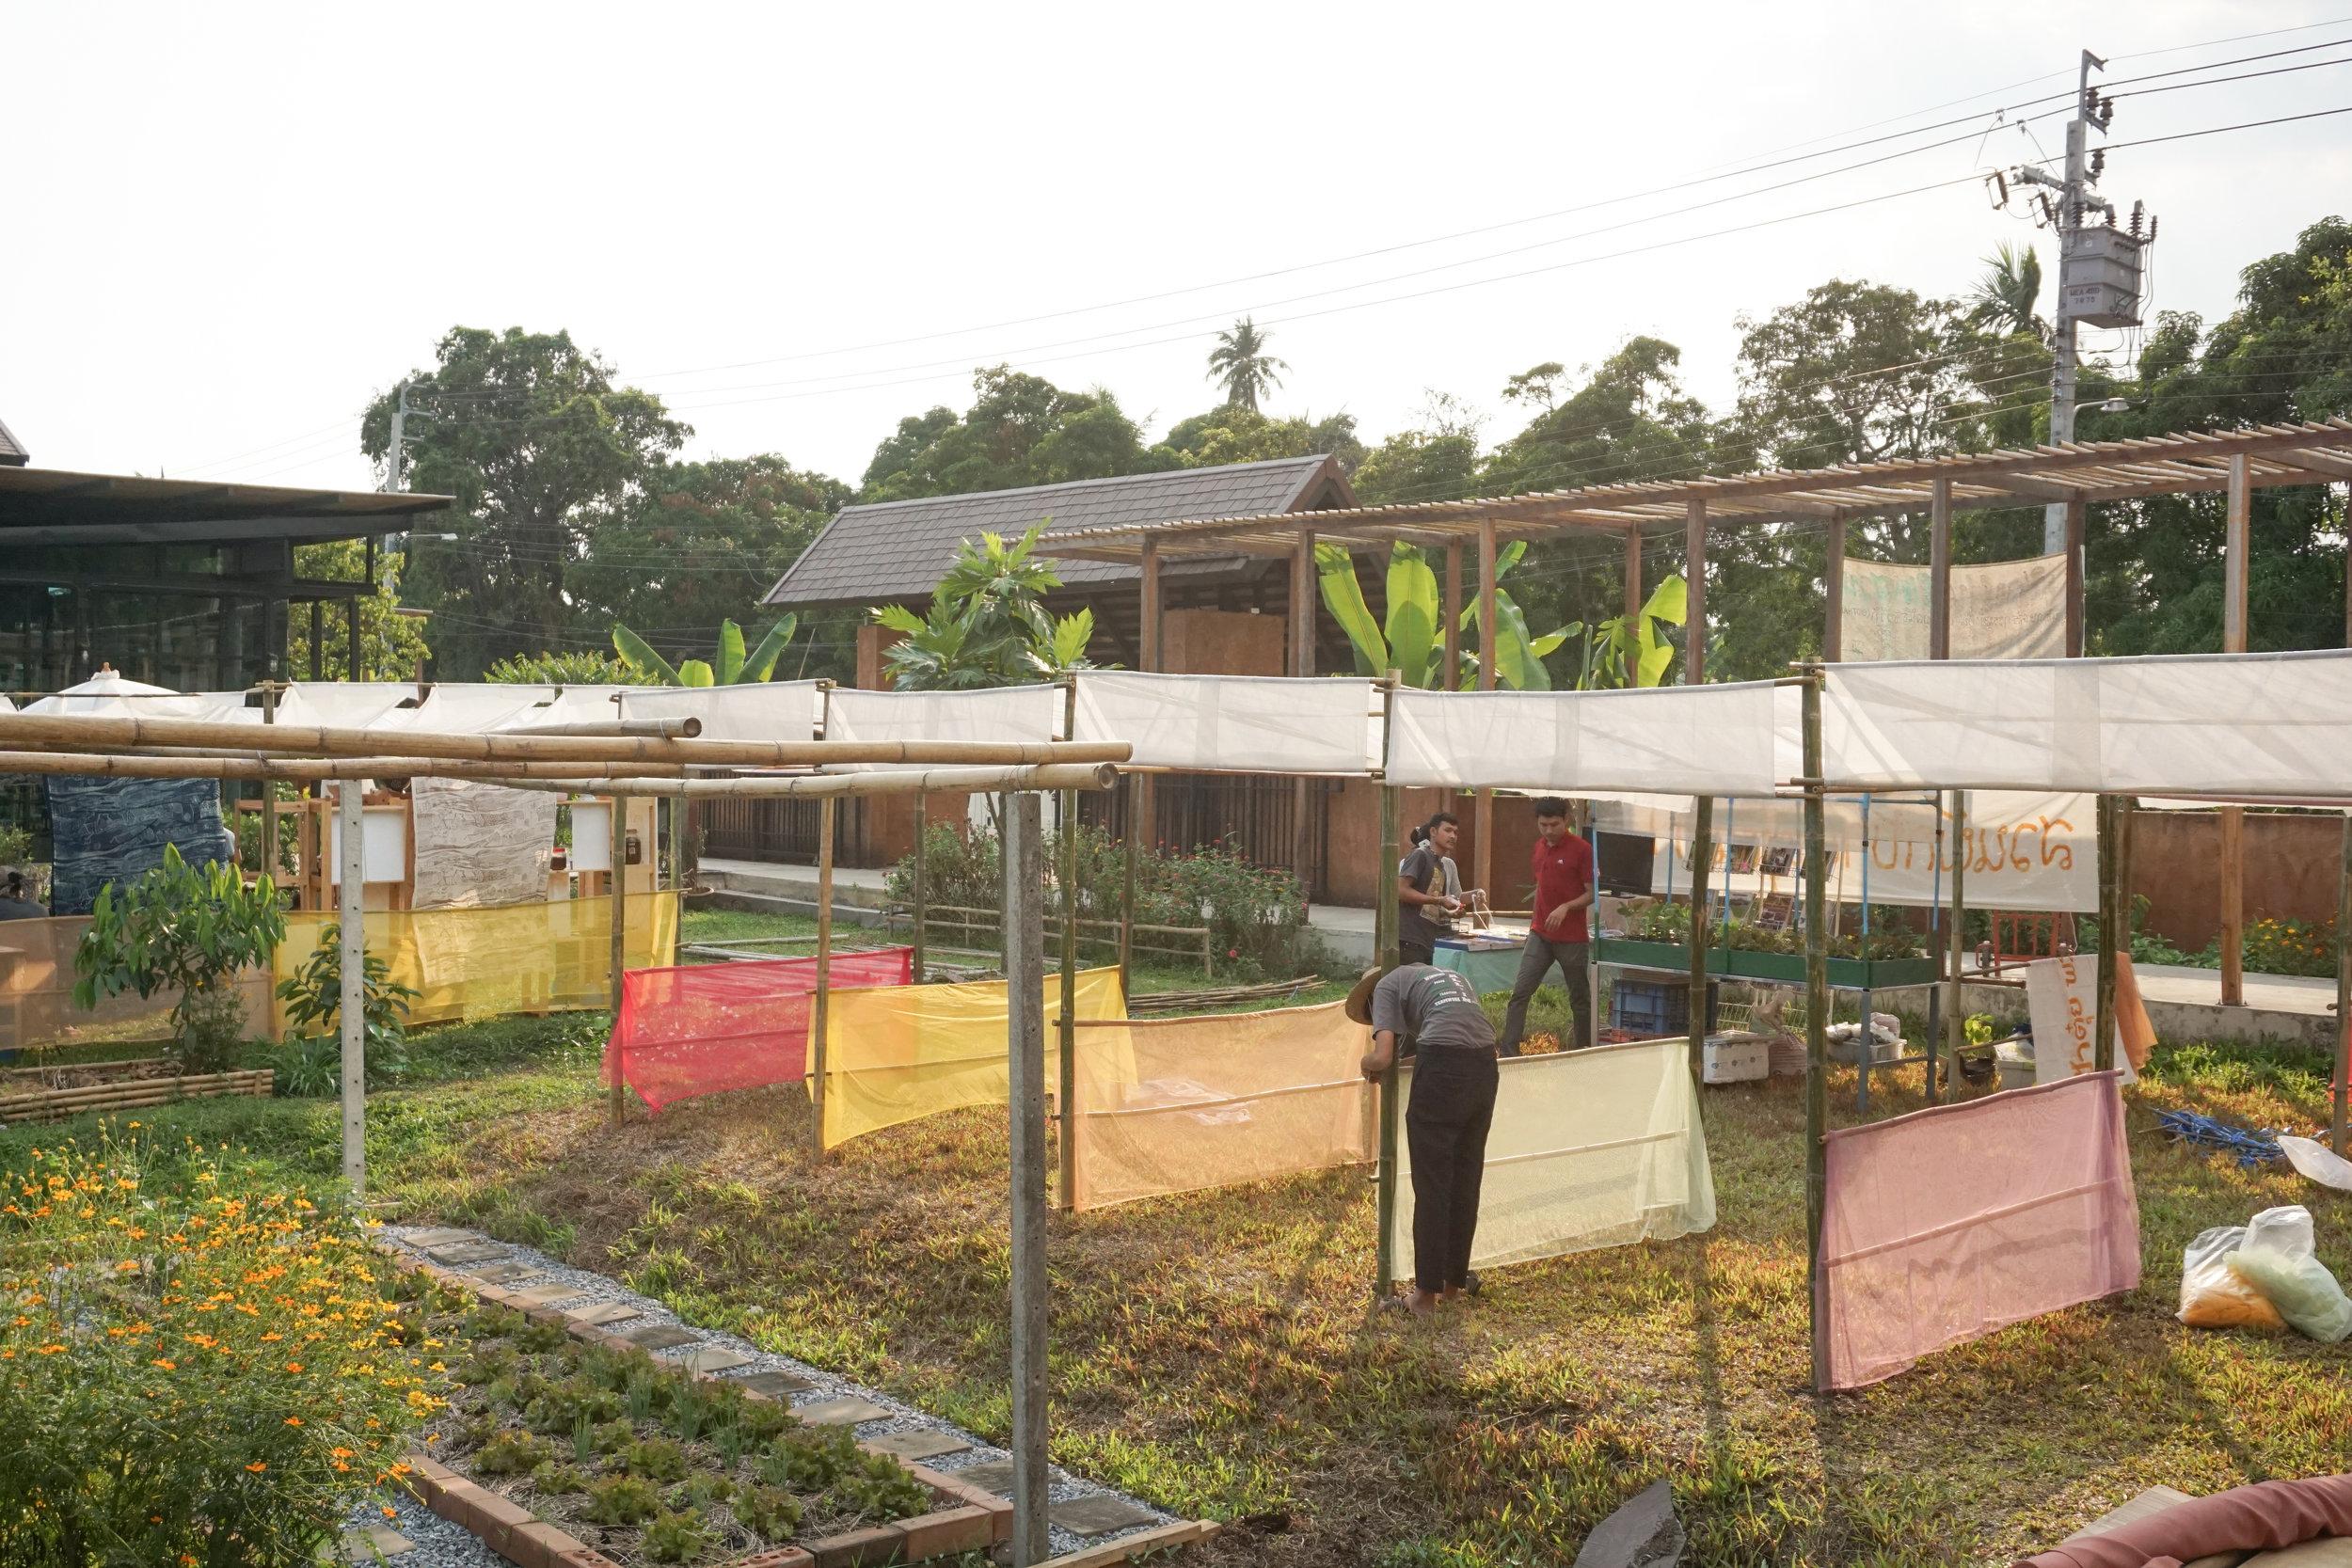 Building the Thai City Farm Festival on organic farming